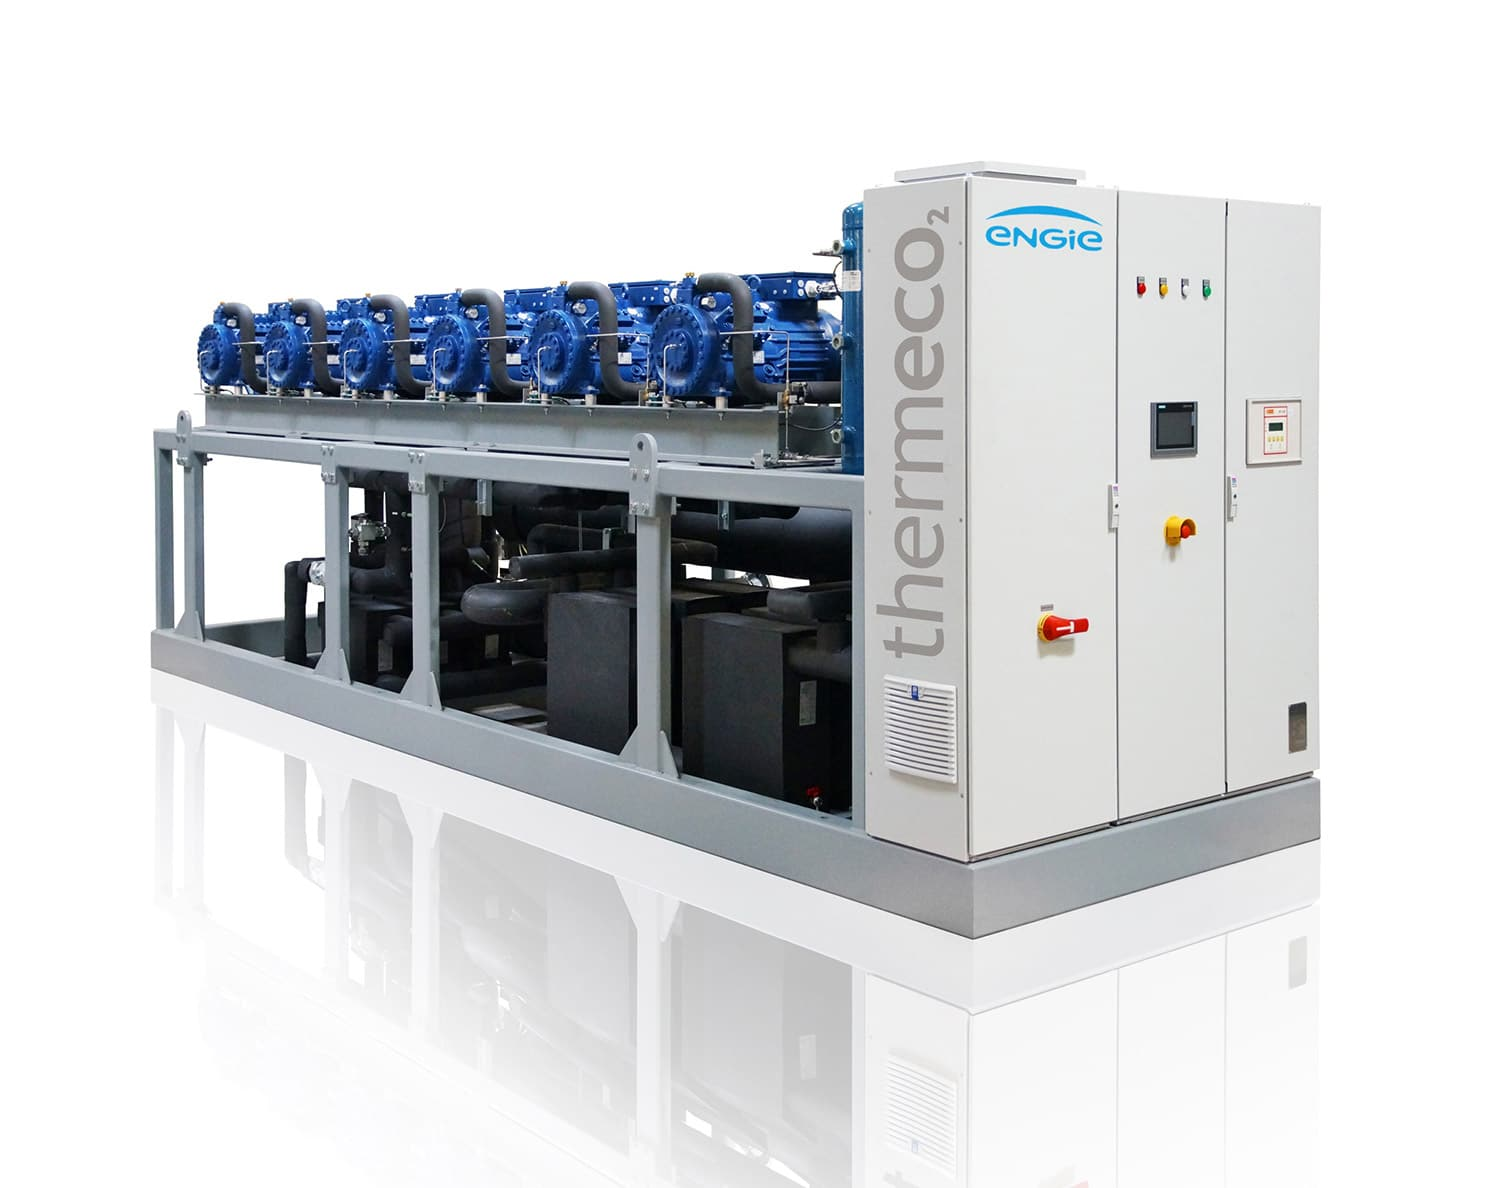 Thermeco2 high-temperature heat pump